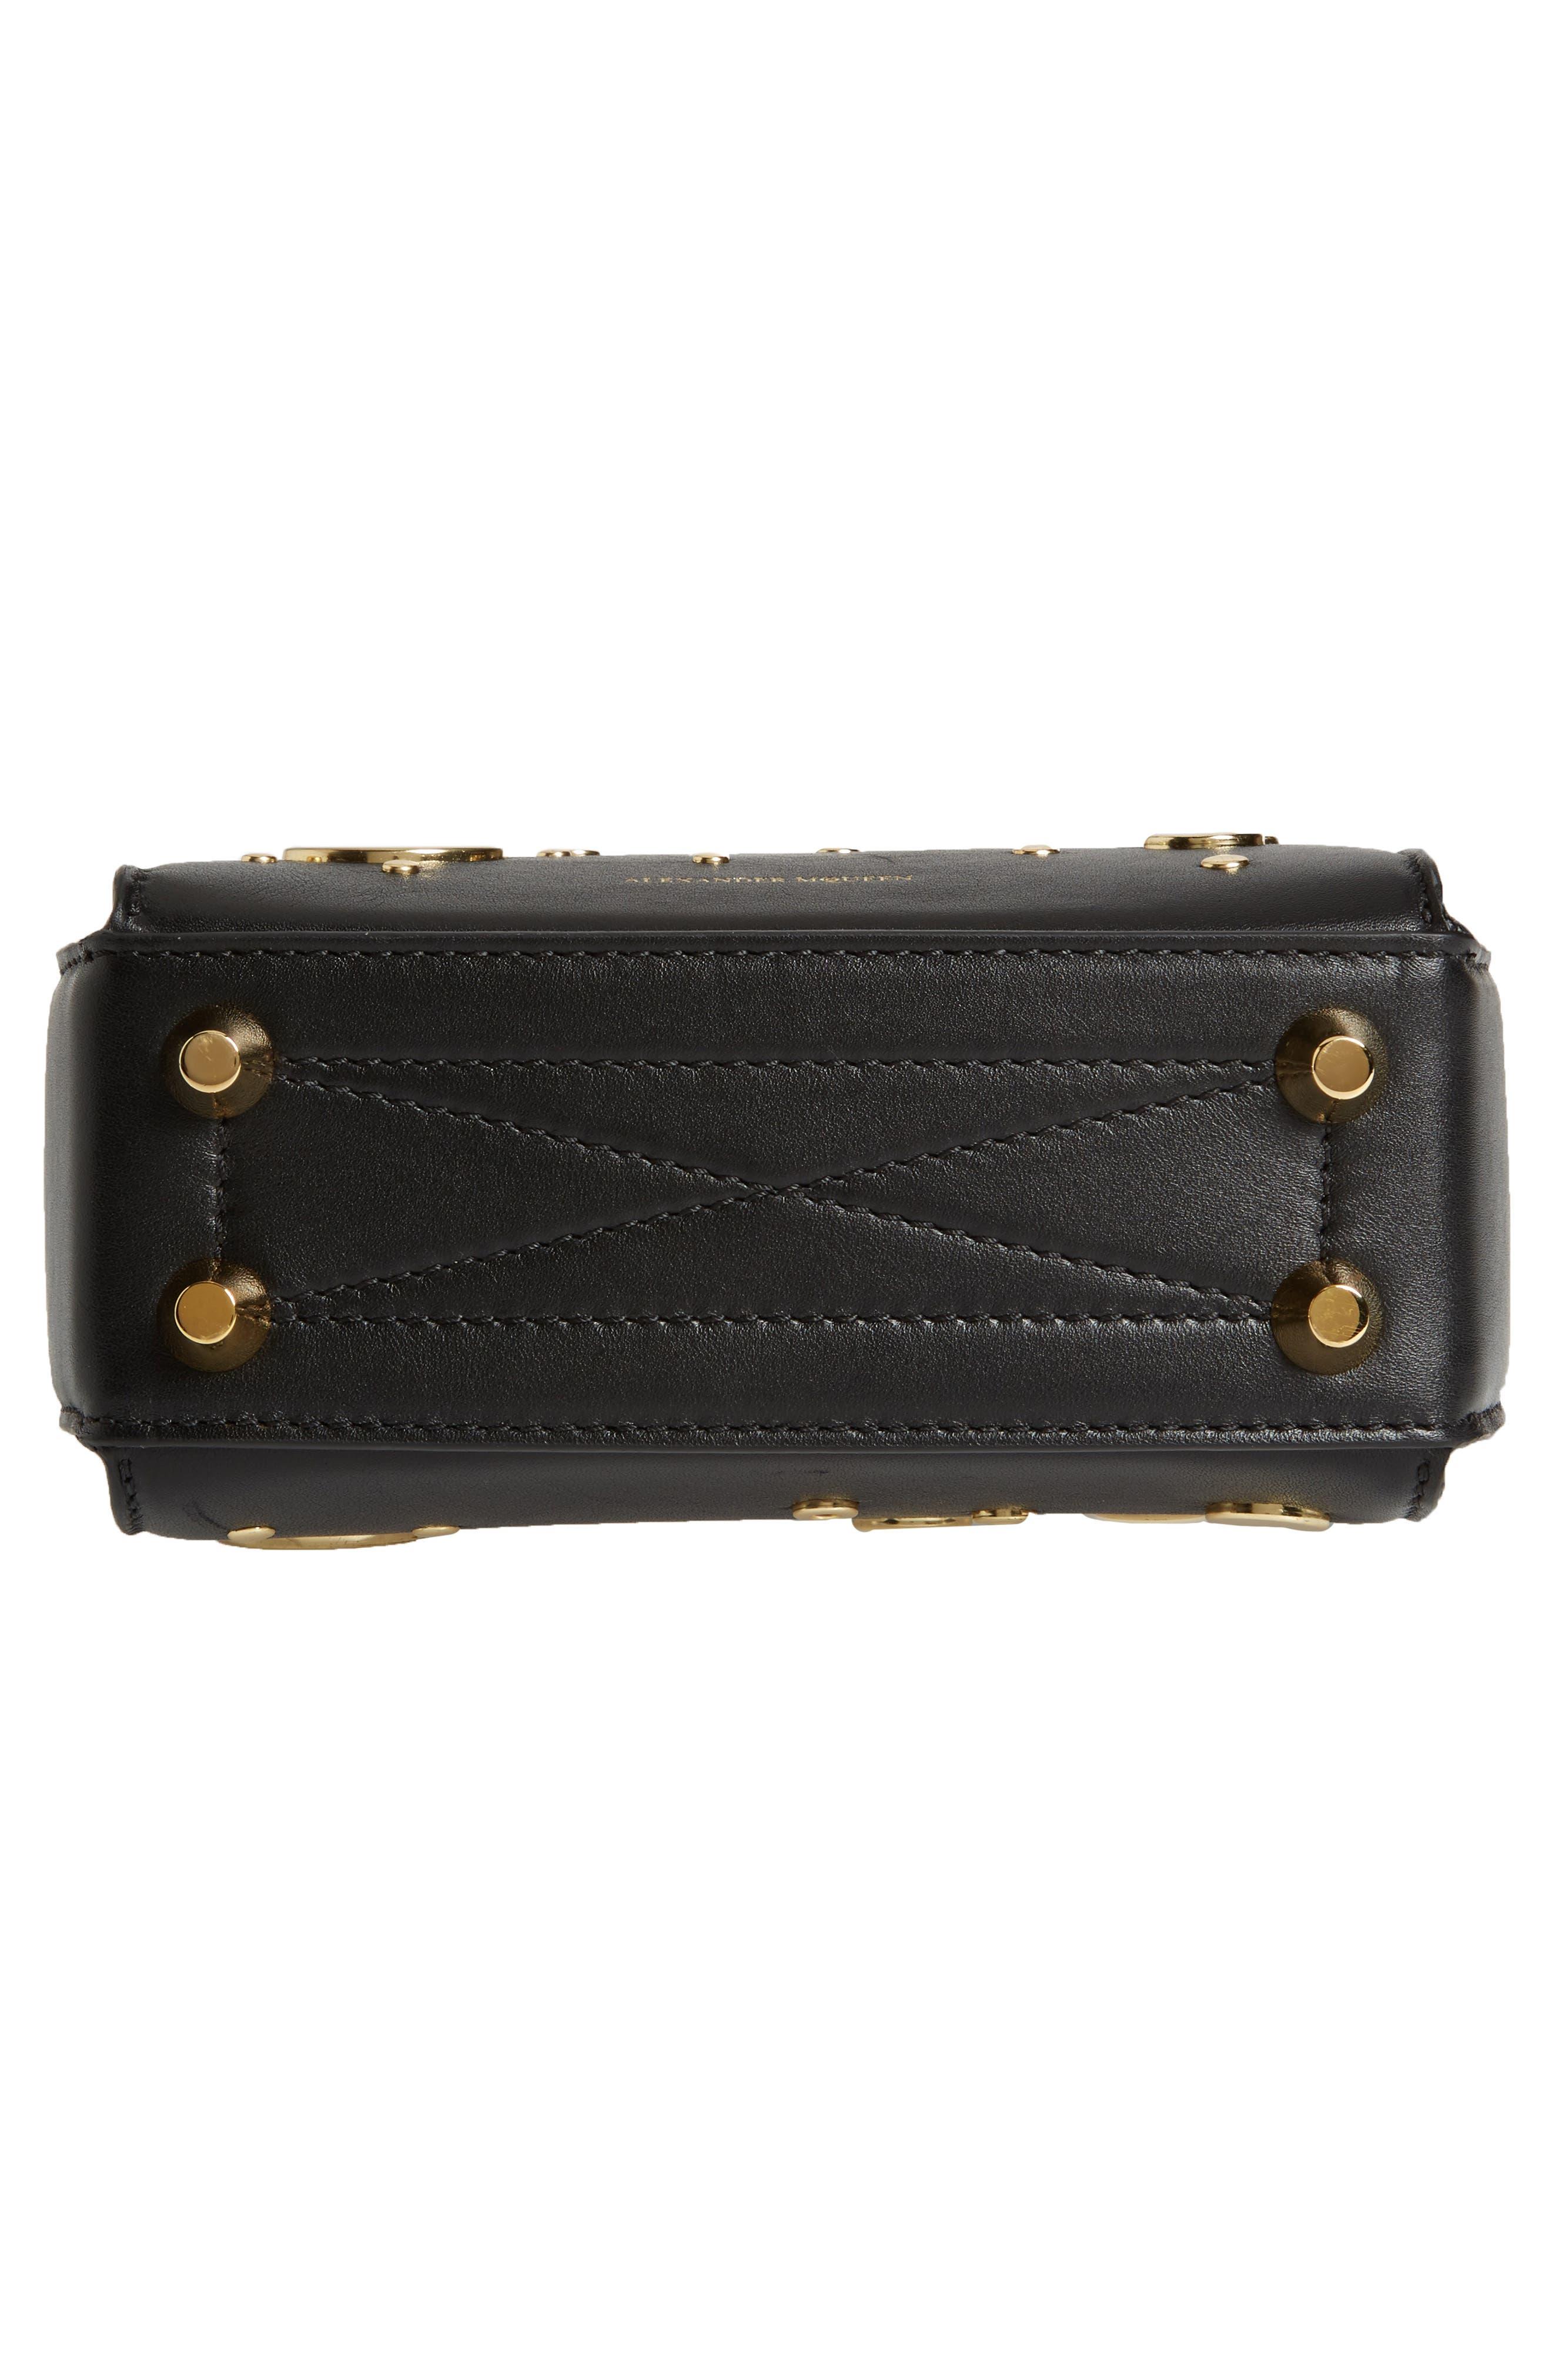 Grommet & Stud Calfskin Leather Box Bag,                             Alternate thumbnail 5, color,                             Black